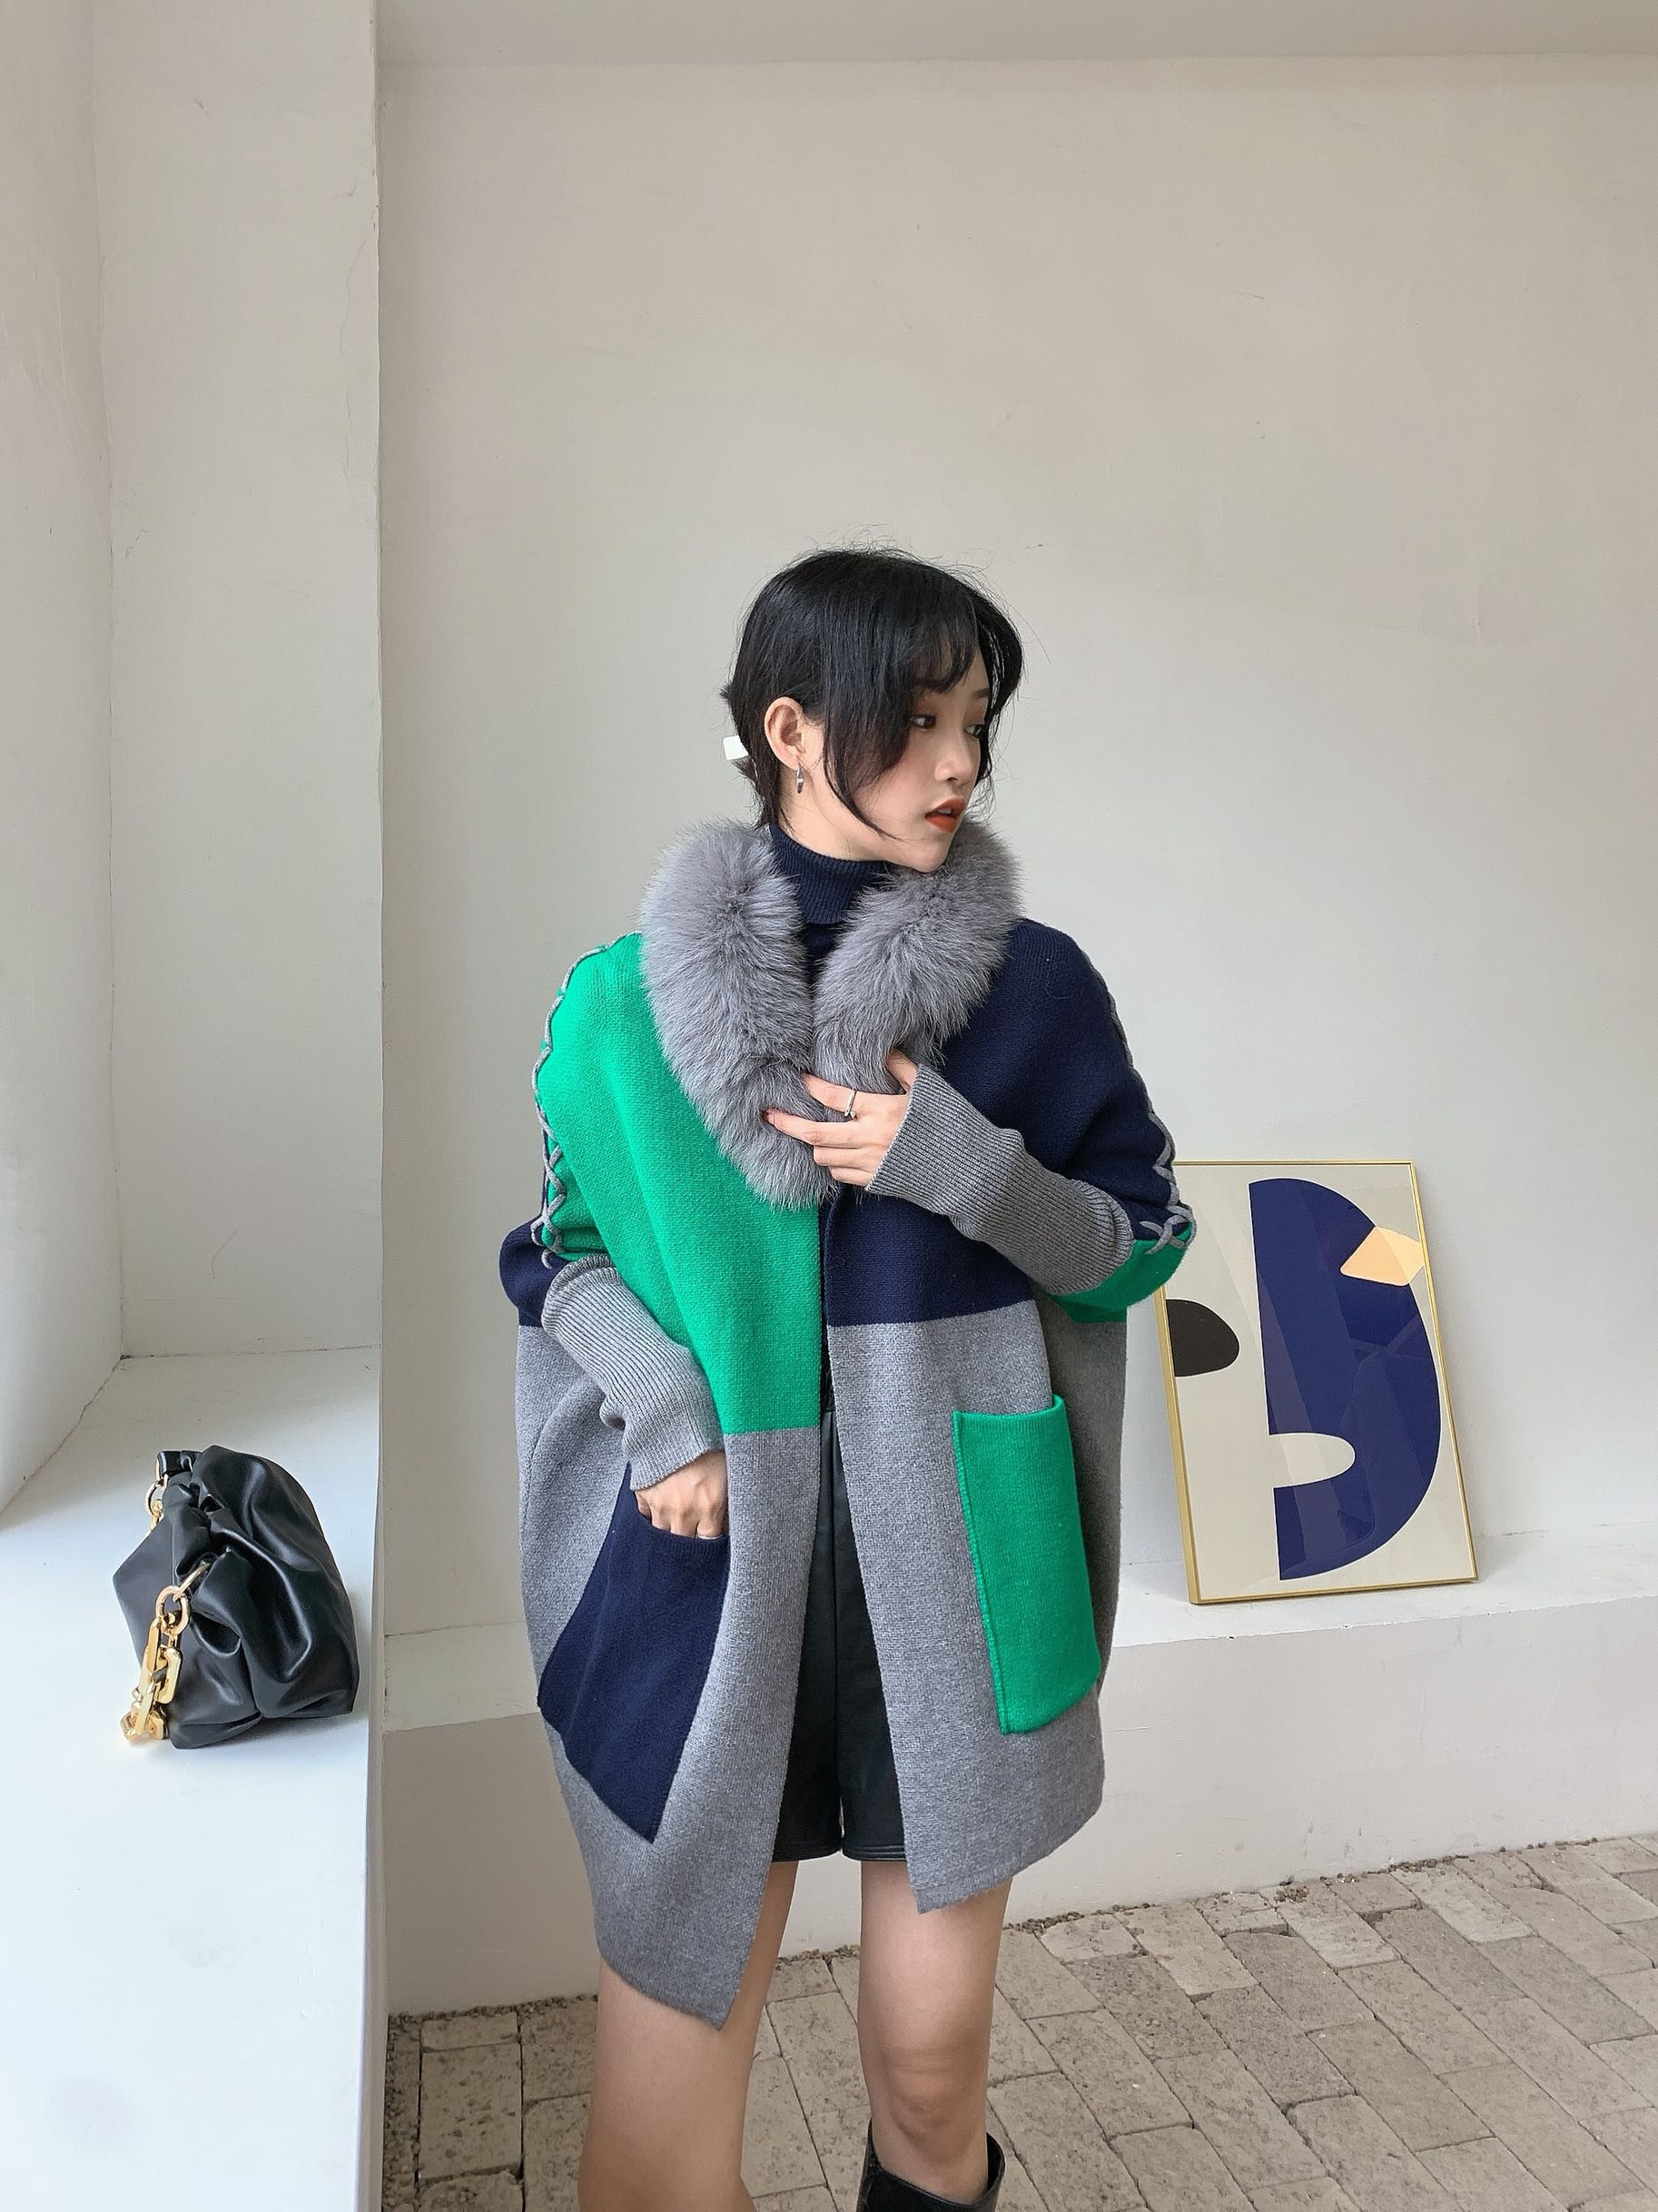 Jumper Cardigan Feminino Women 's 2020 Winter Sweater New Move Color Matching Drawstring Fur Collar Bat Sleeve Thick Real Fox enlarge